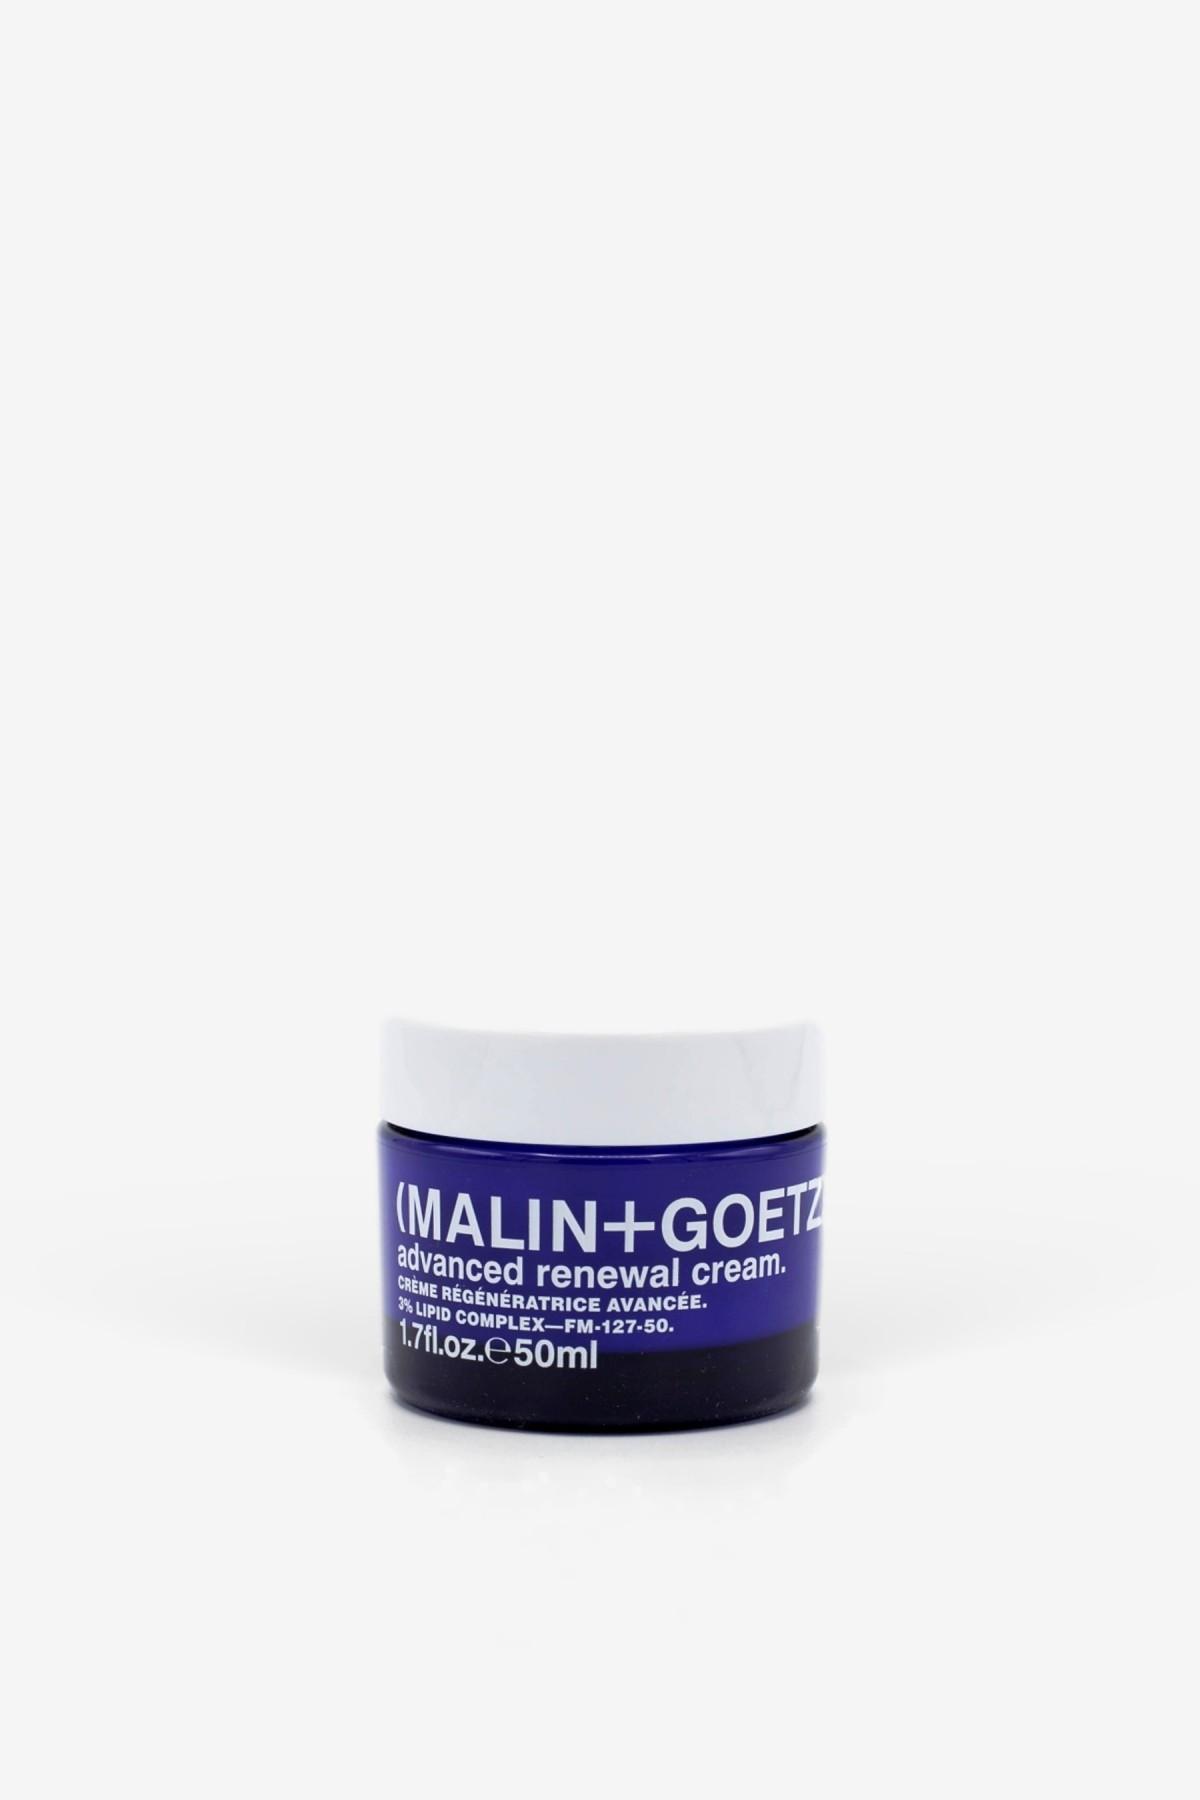 Malin+Goetz Advanced Renewal Cream 50ml in